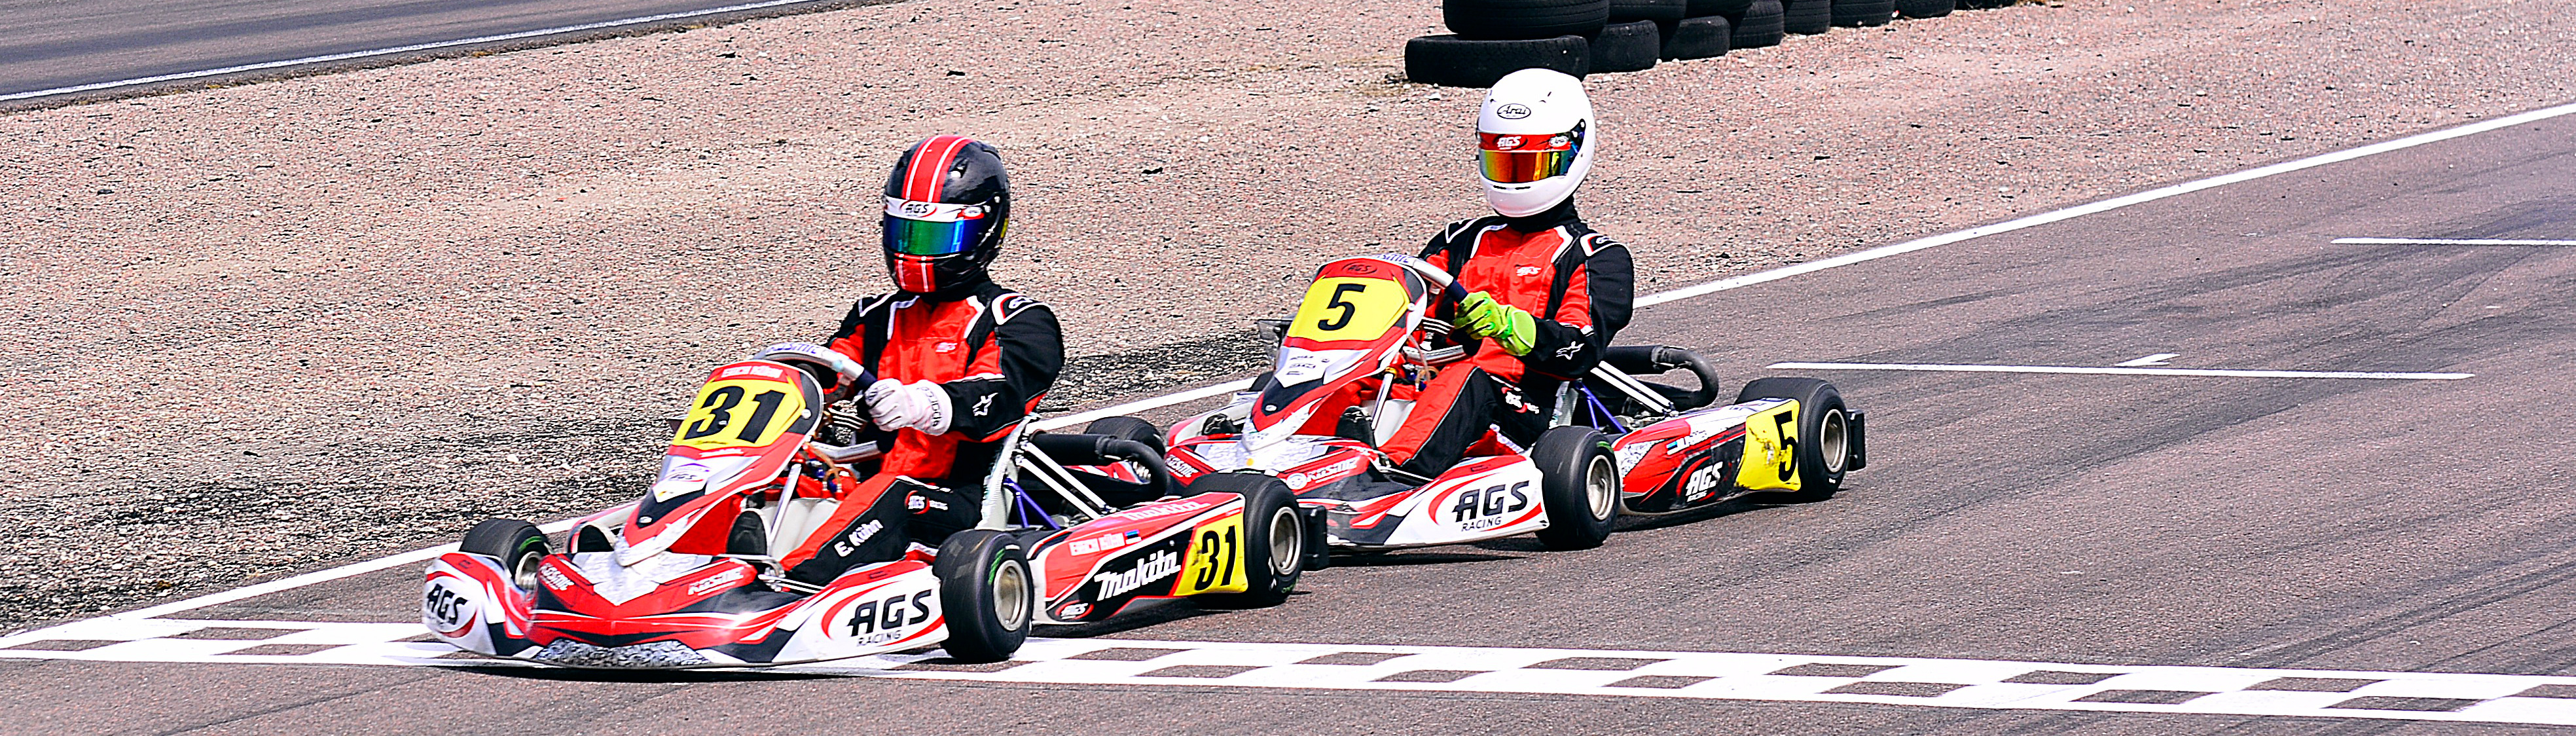 ags_racing_team_slider